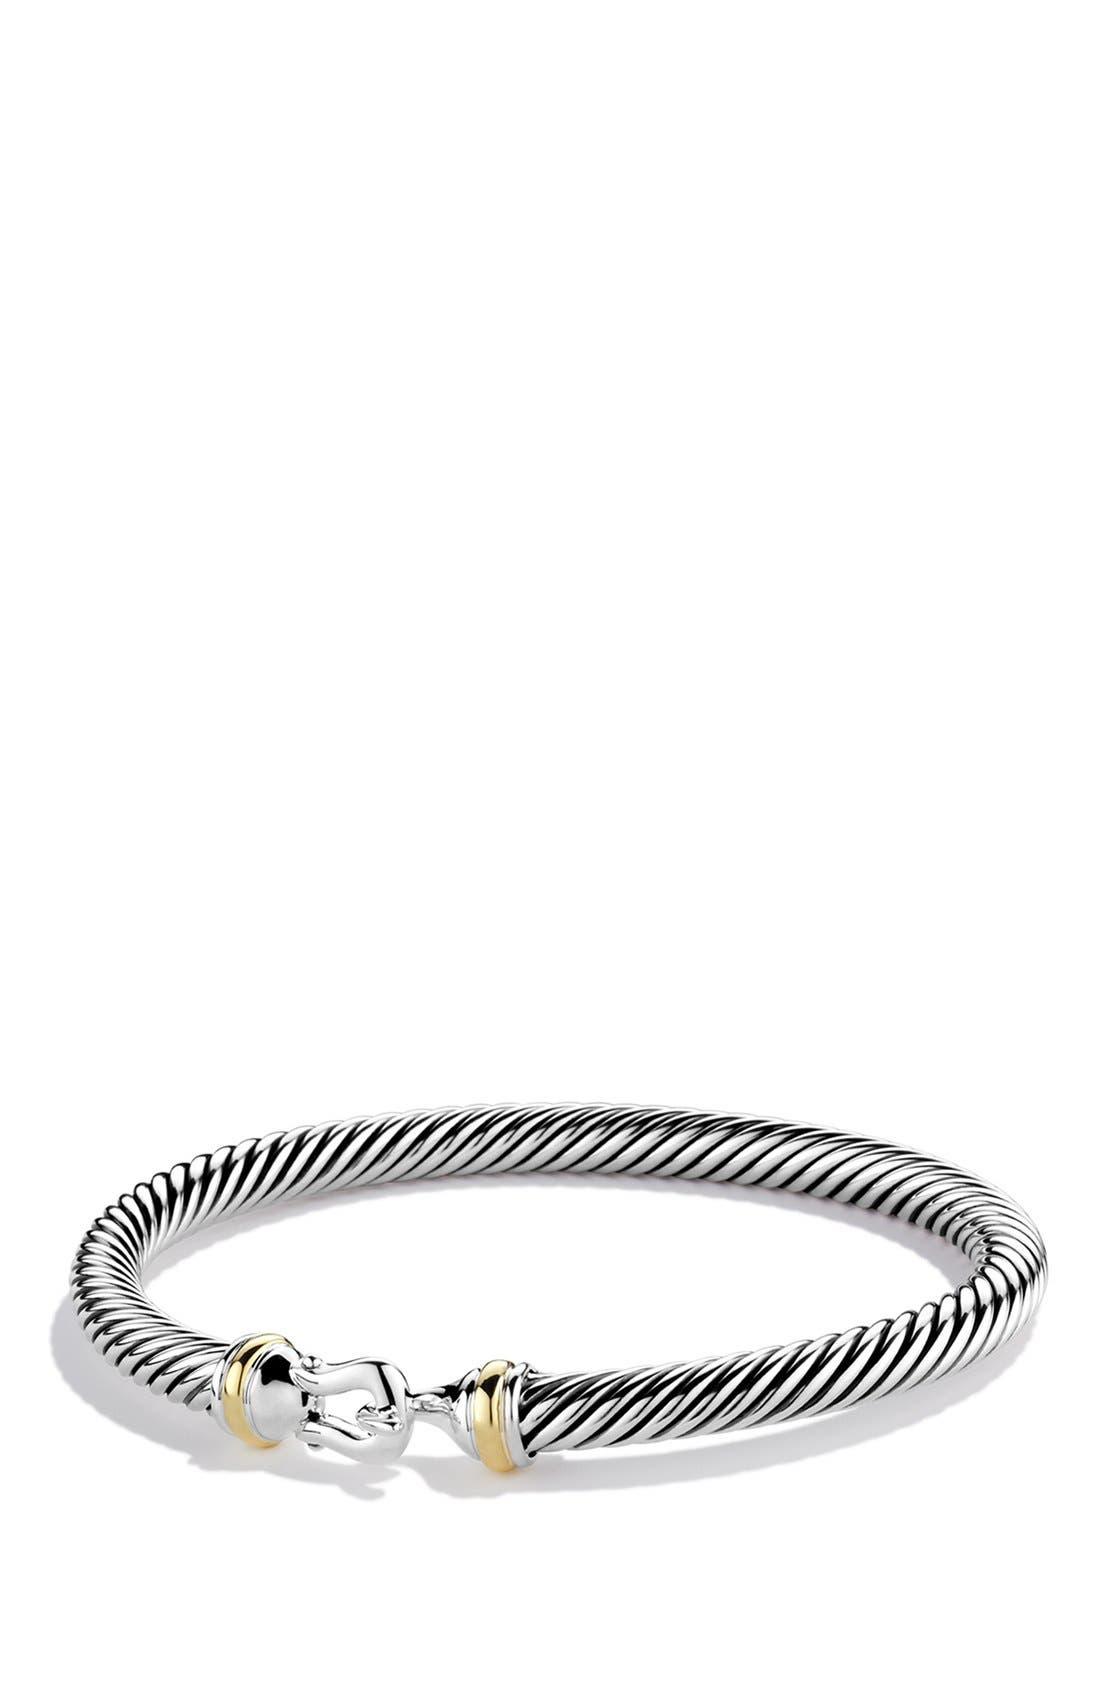 Main Image - David Yurman 'Cable Buckle' Bracelet